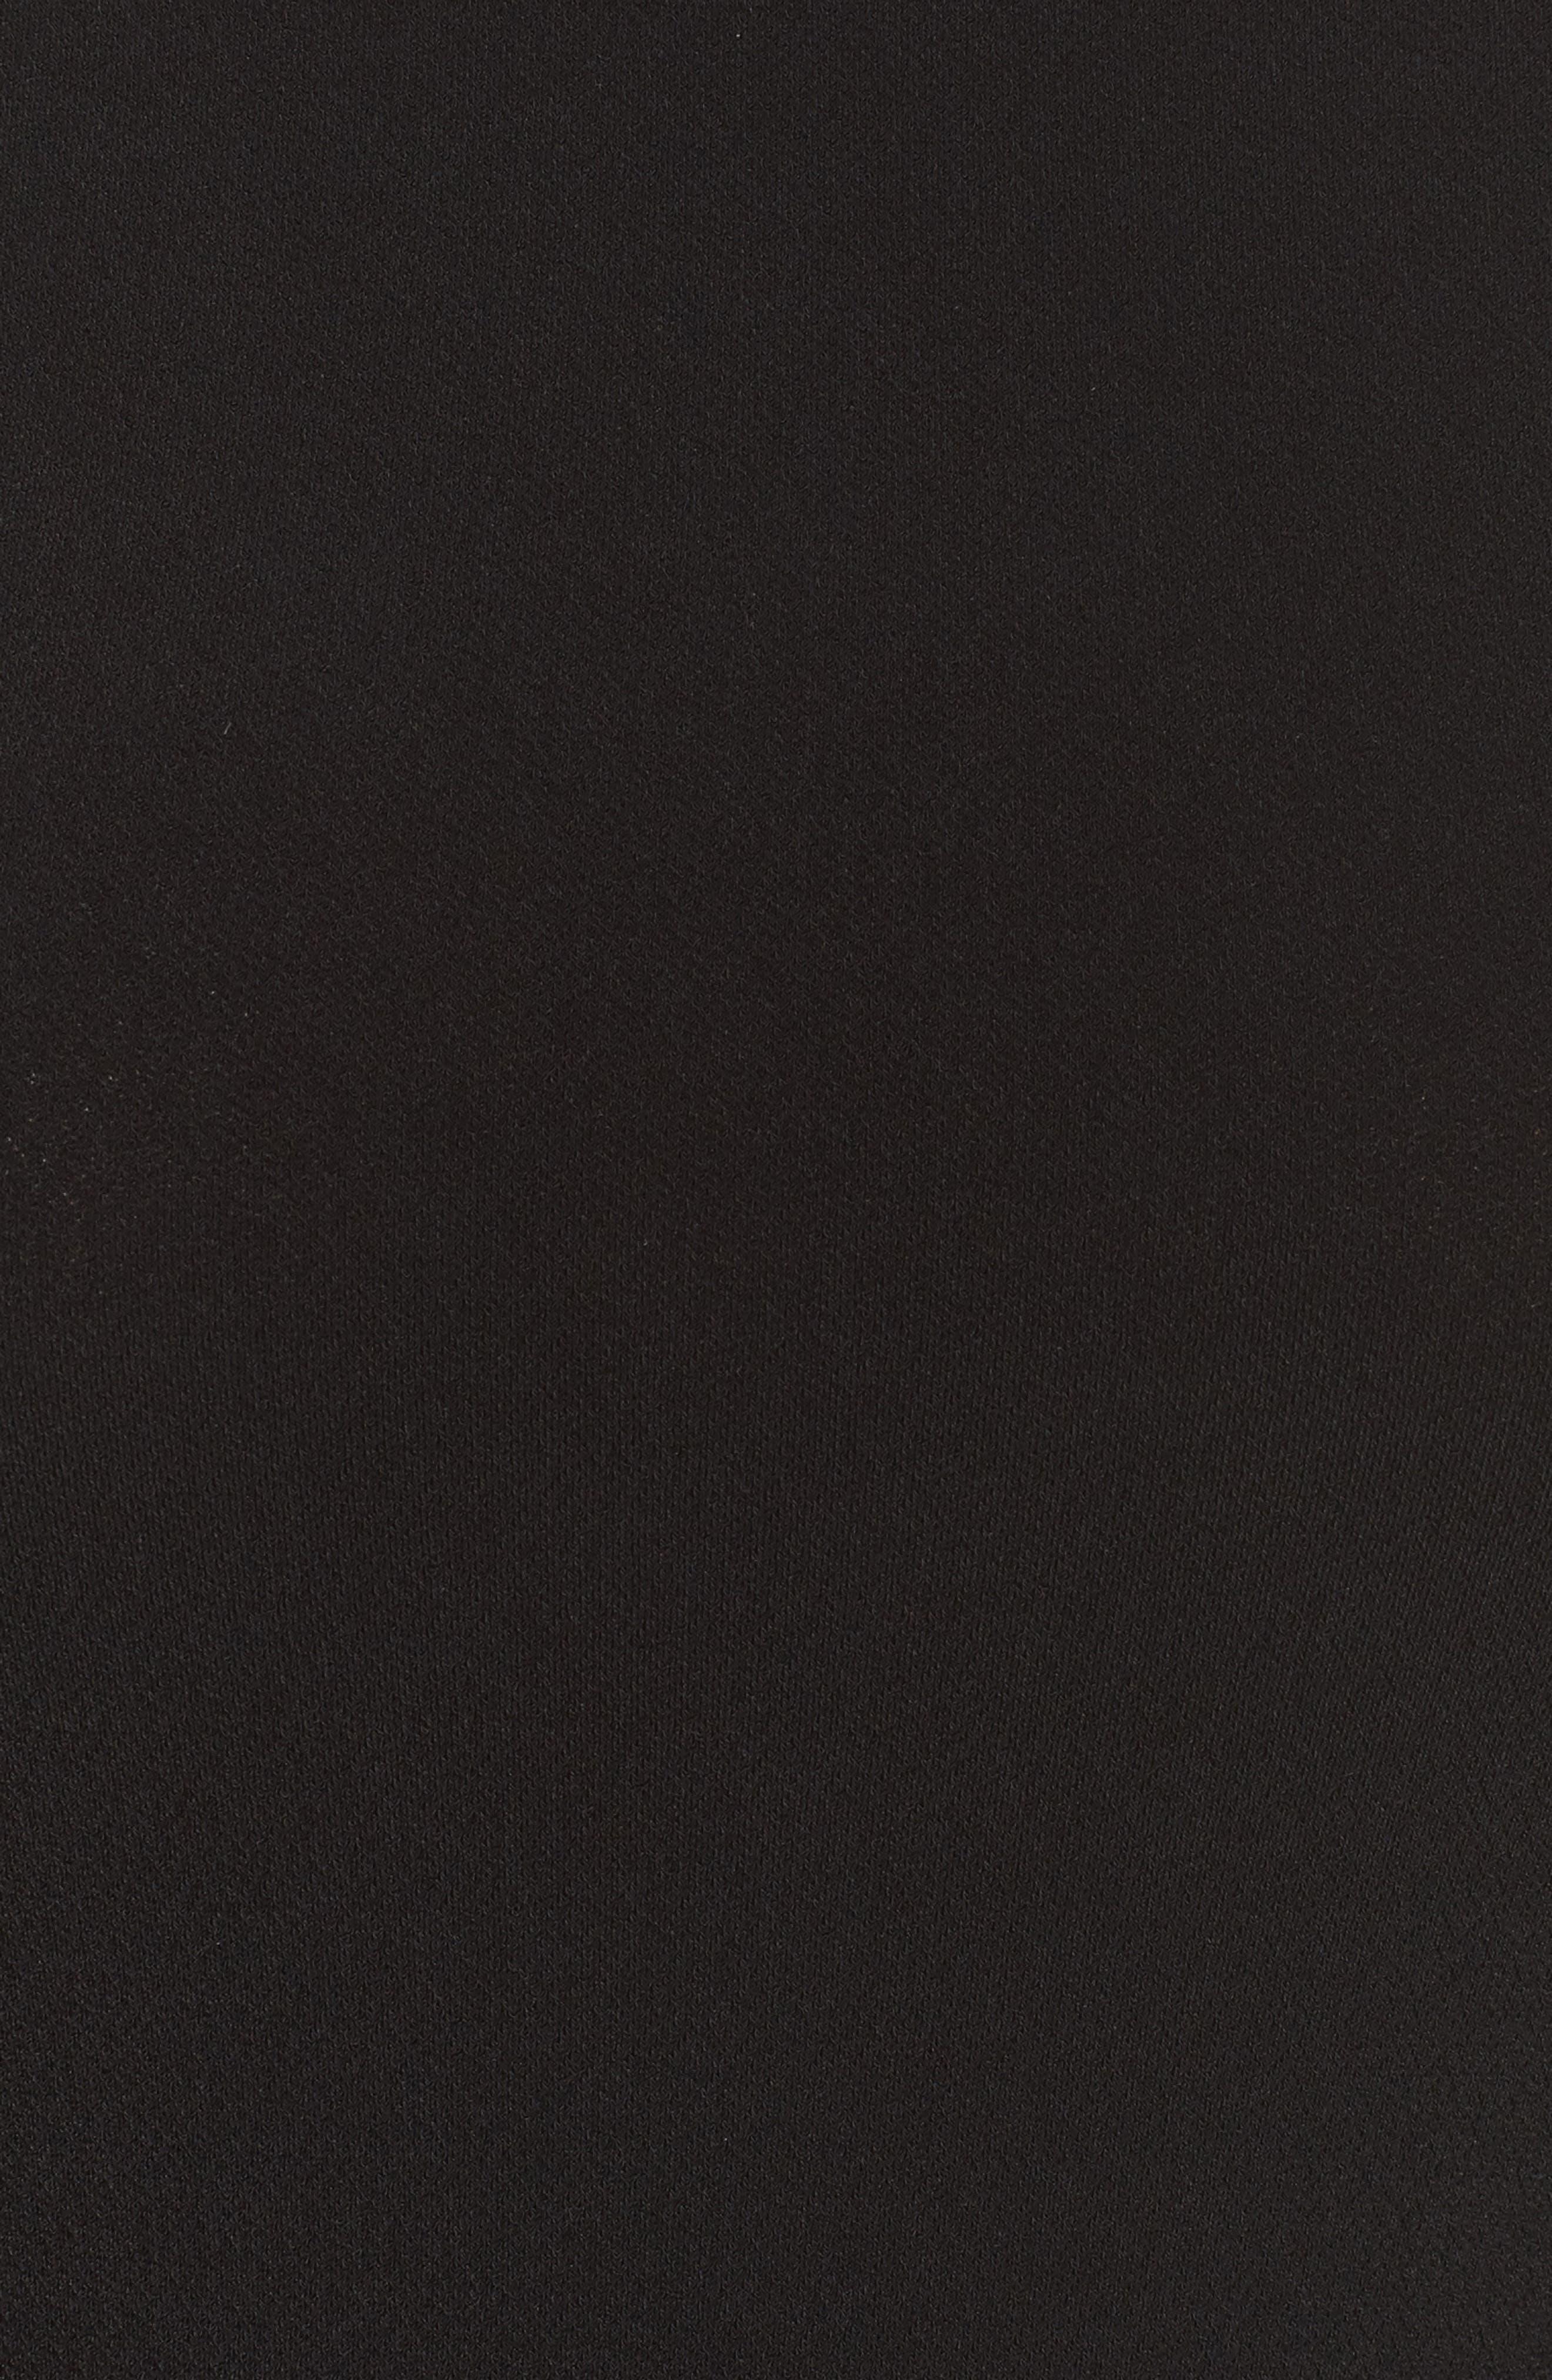 Belted Print Jersey A-Line Dress,                             Alternate thumbnail 6, color,                             Black Crepe